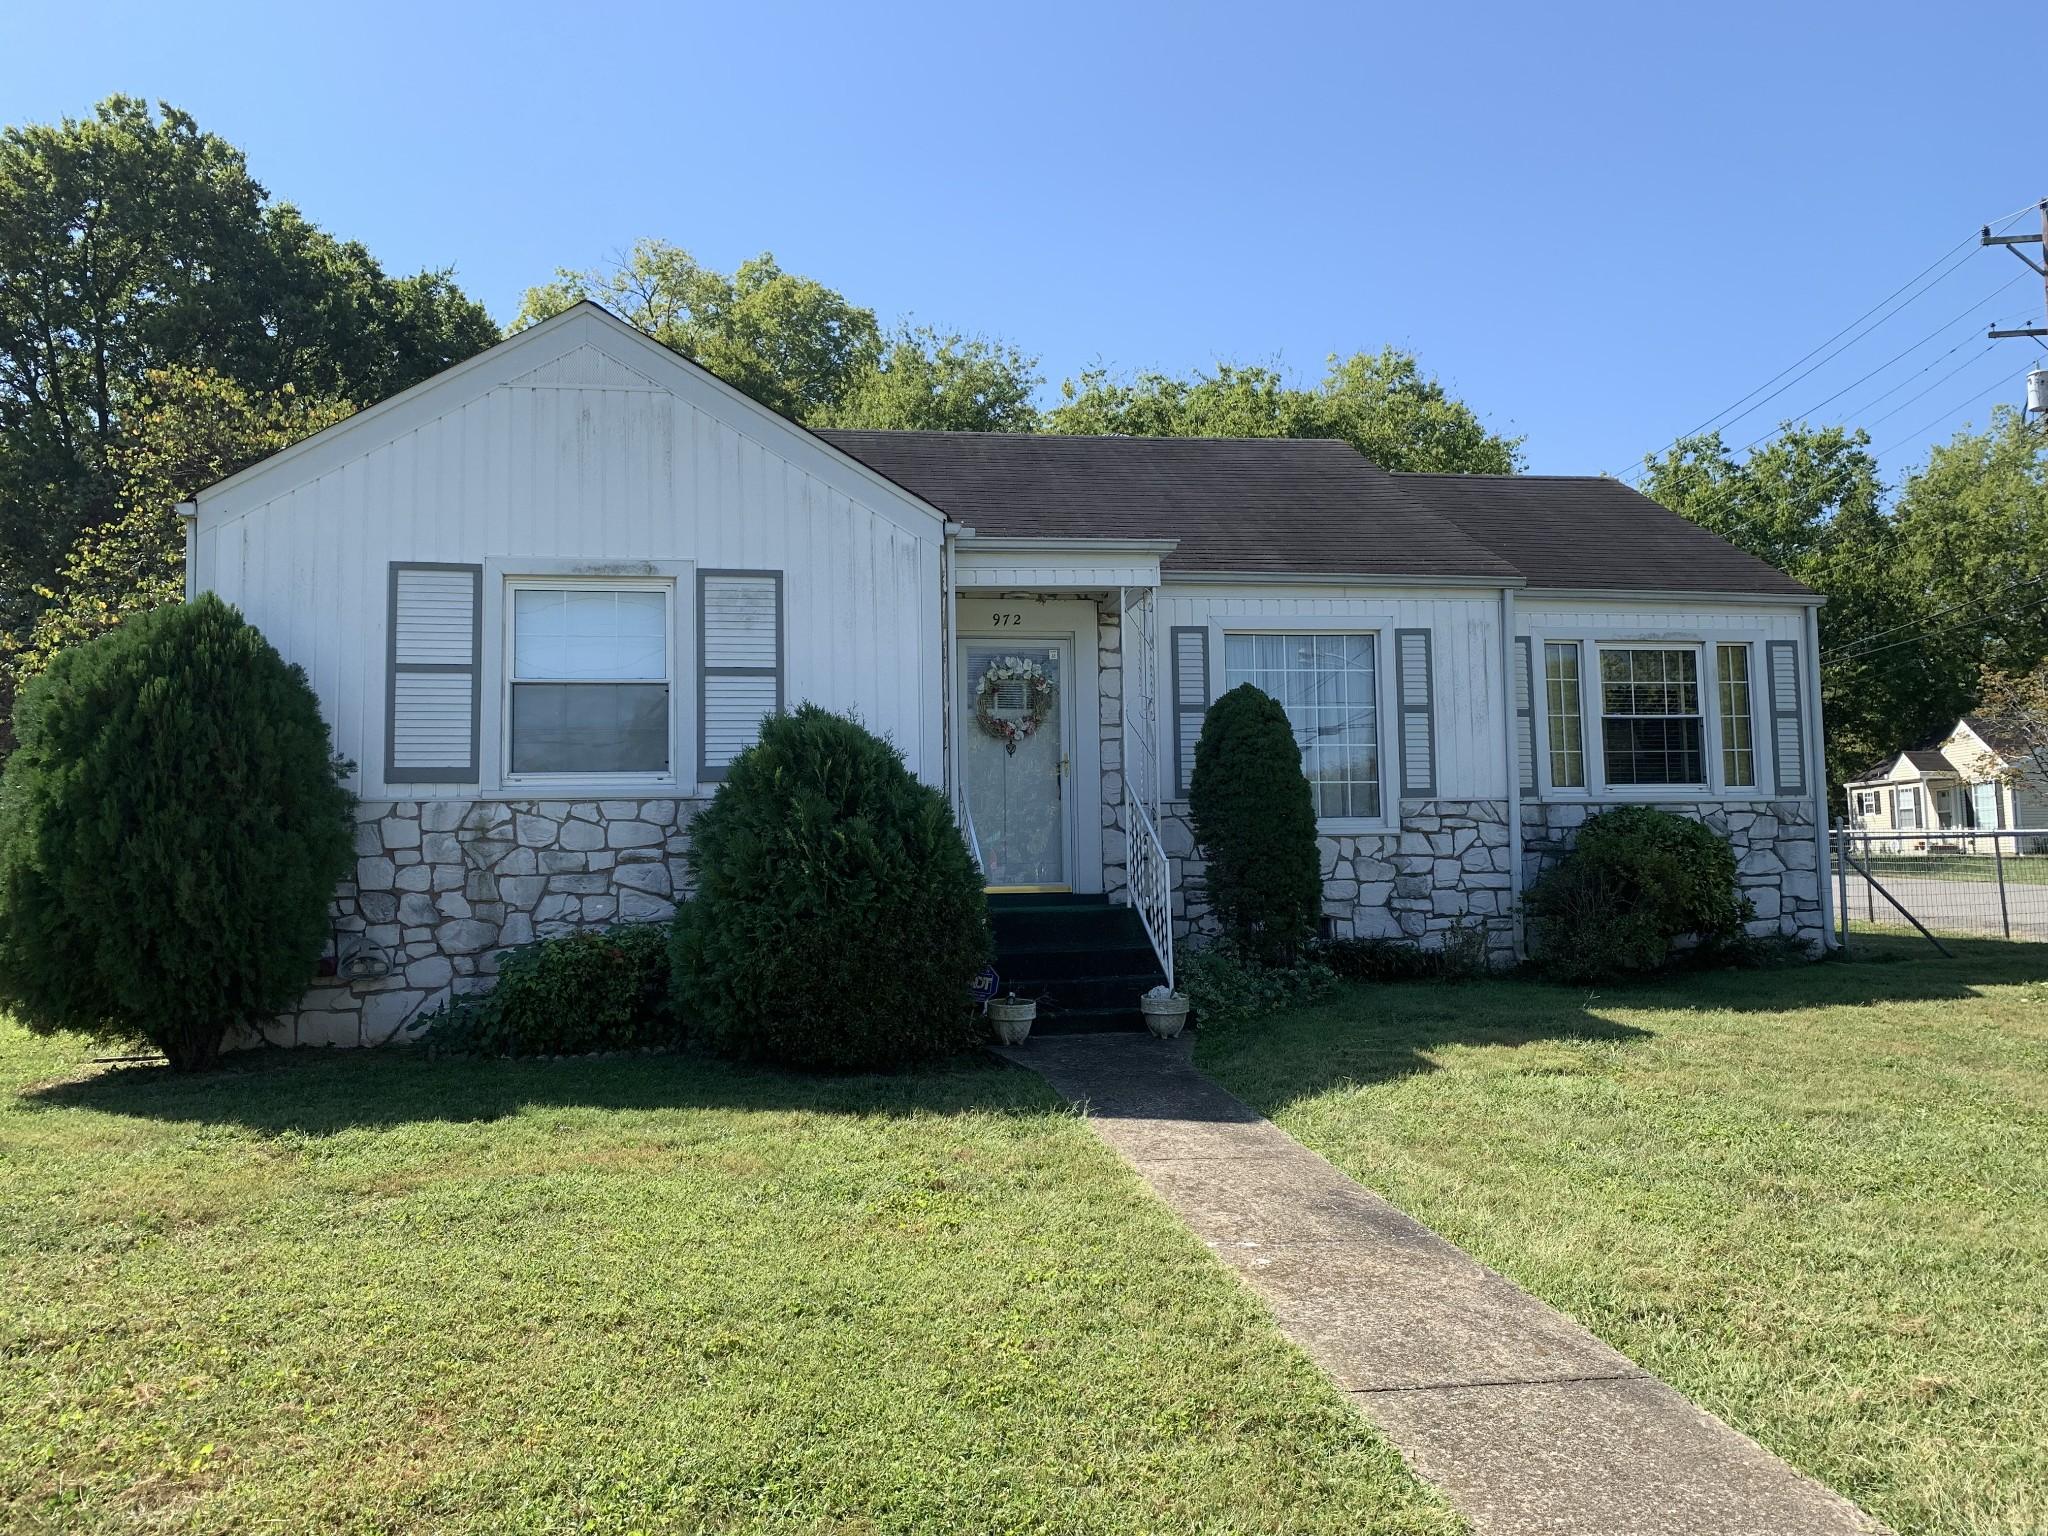 972 Malquin Dr Property Photo - Nashville, TN real estate listing